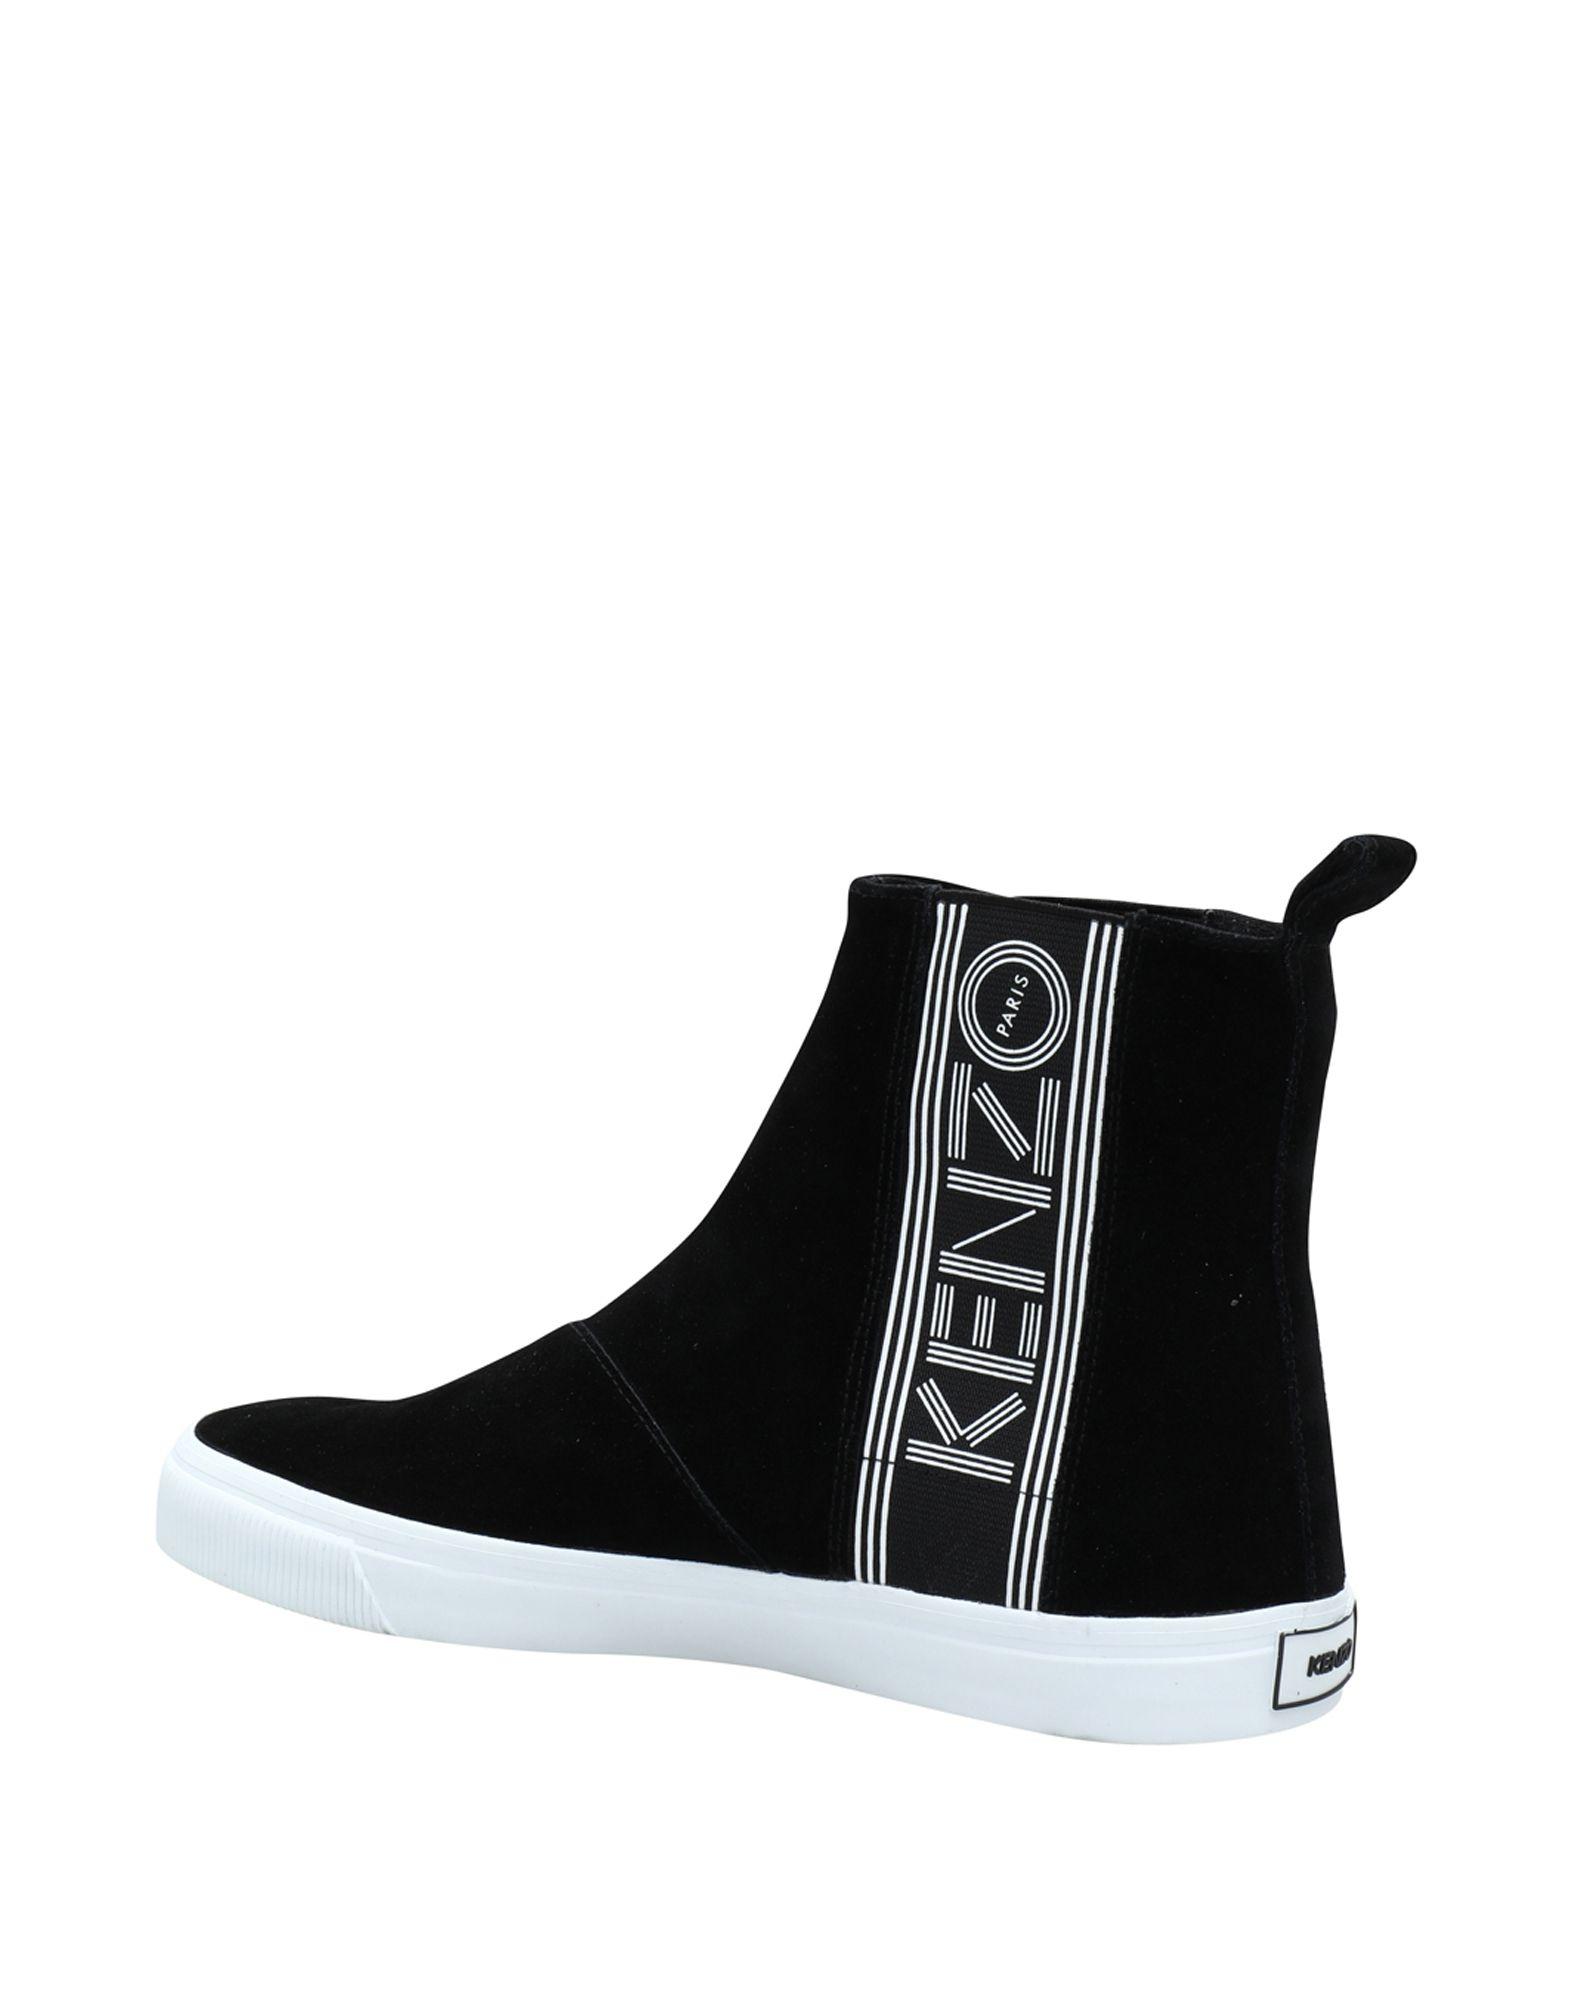 Kenzo  Kapri High Top Sneakers  Kenzo 11555272JR Gute Qualität beliebte Schuhe 490f95